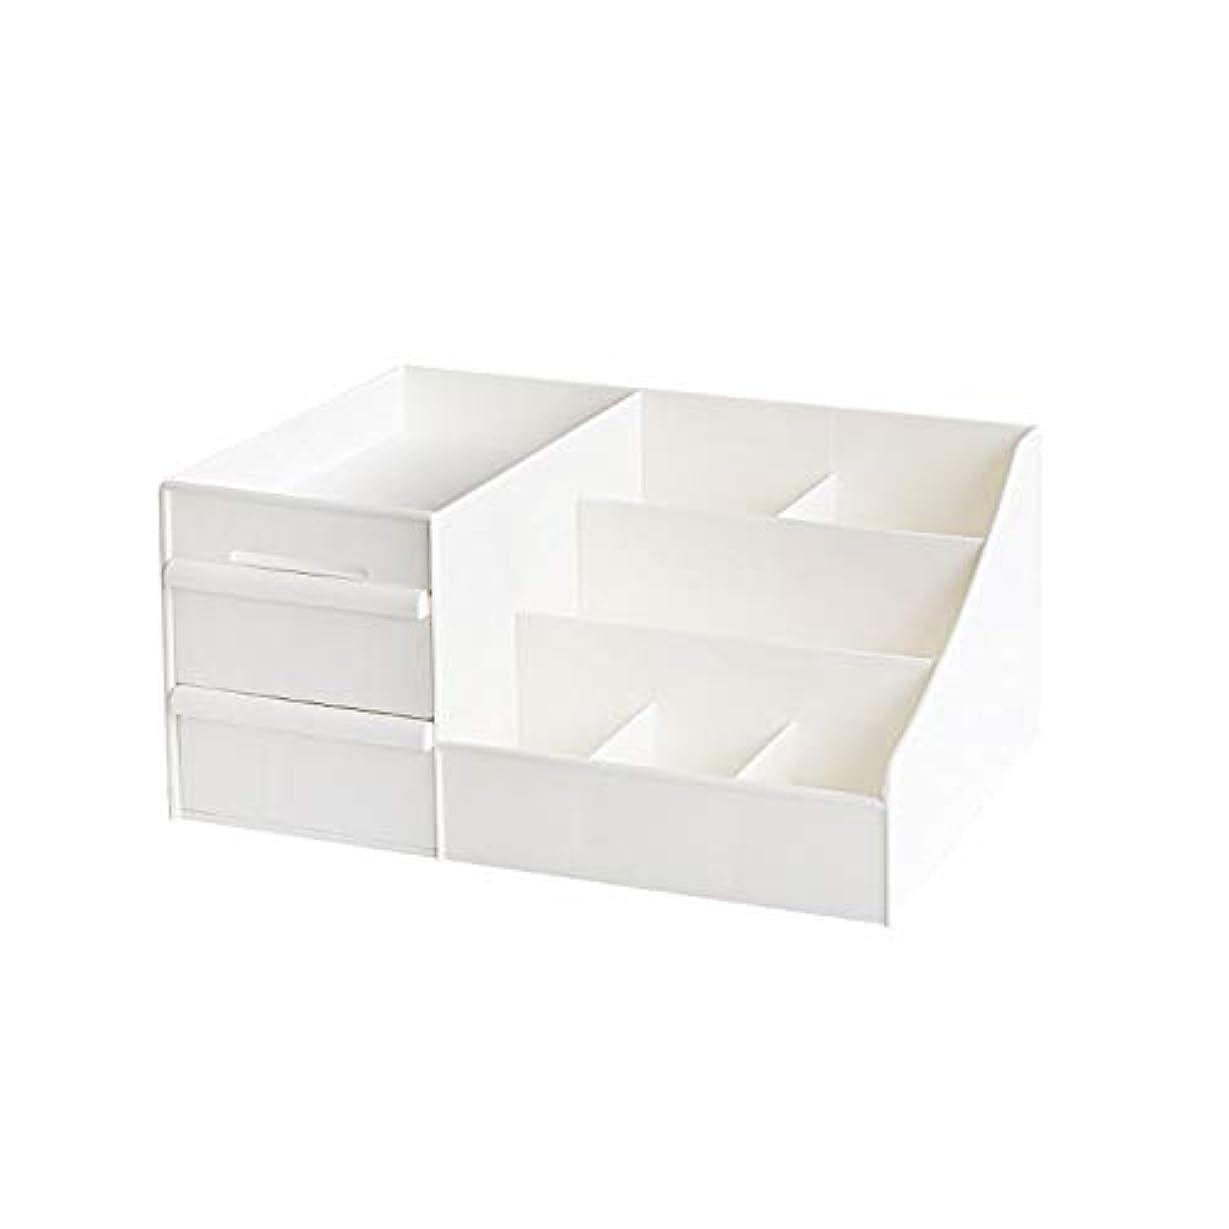 Bostar 化粧品収納ボックス メイクボックス コスメケース 引き出し 小物入れ 収納ケース 整理簡単 レディース 北欧 おしゃれ ホワイト